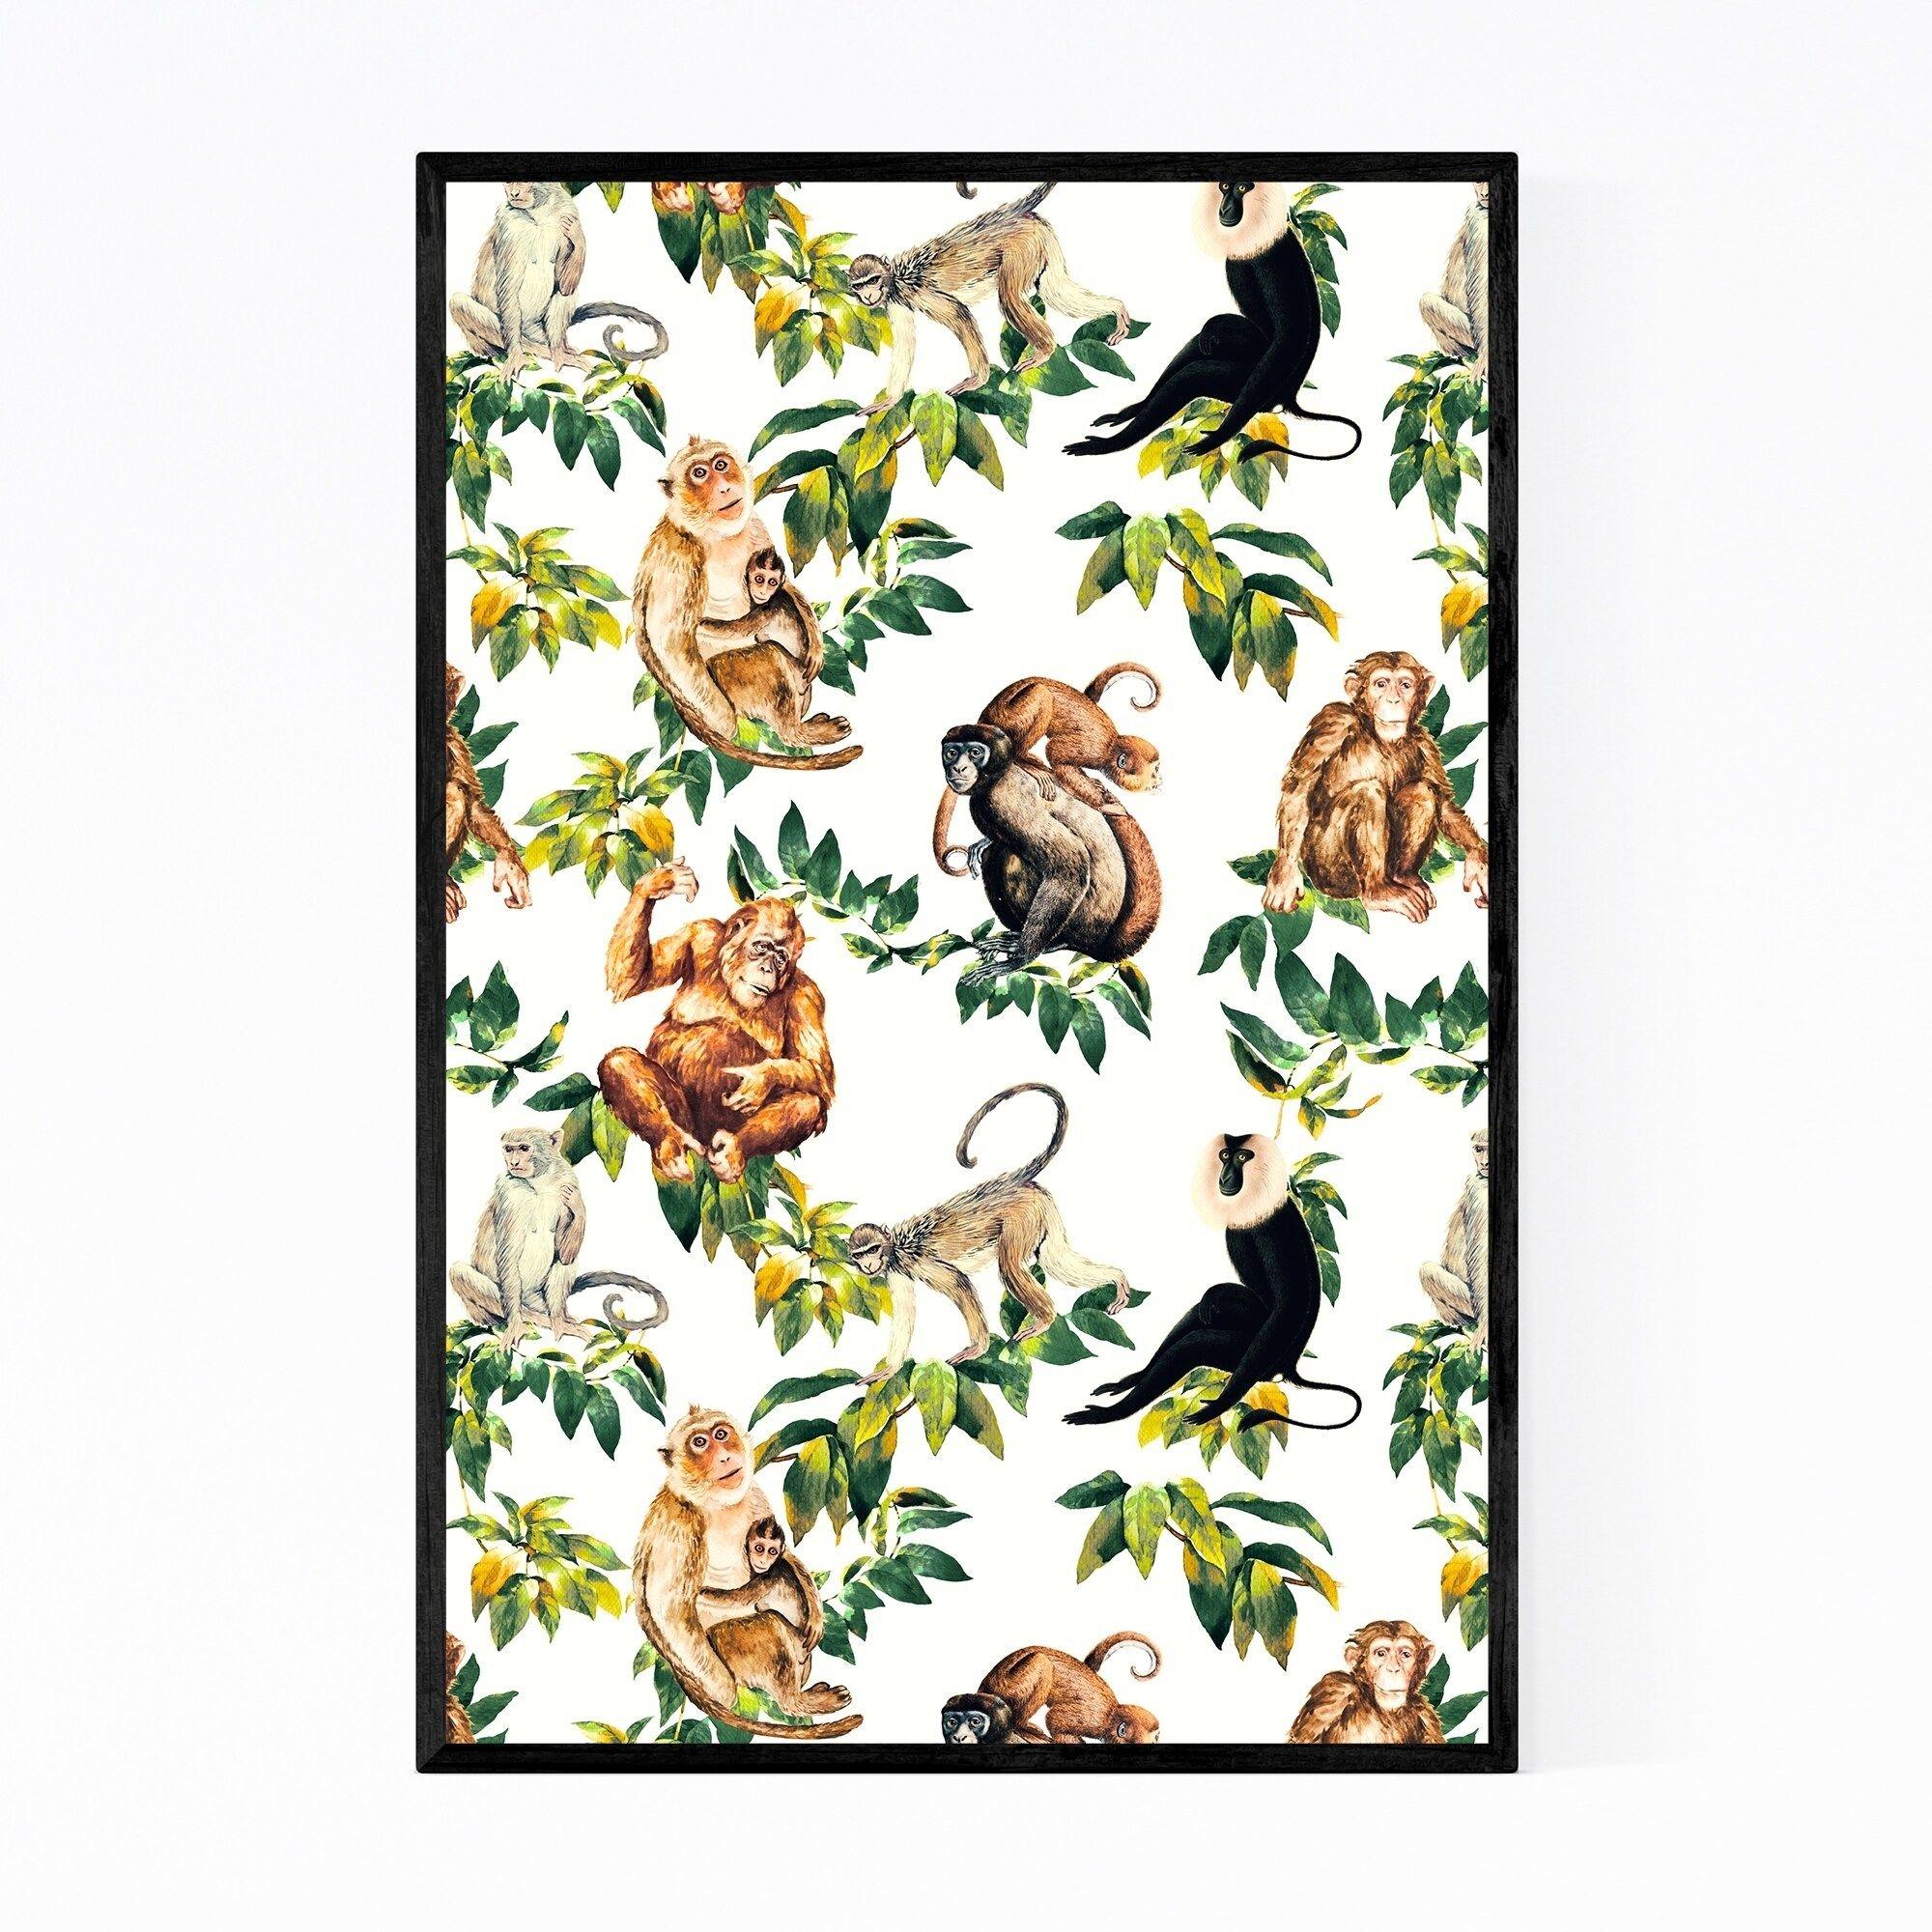 Noir Gallery Monkey Orangutan Jungle Pattern Framed Art Print (Black - 20 x 30), Multicolor #junglepattern